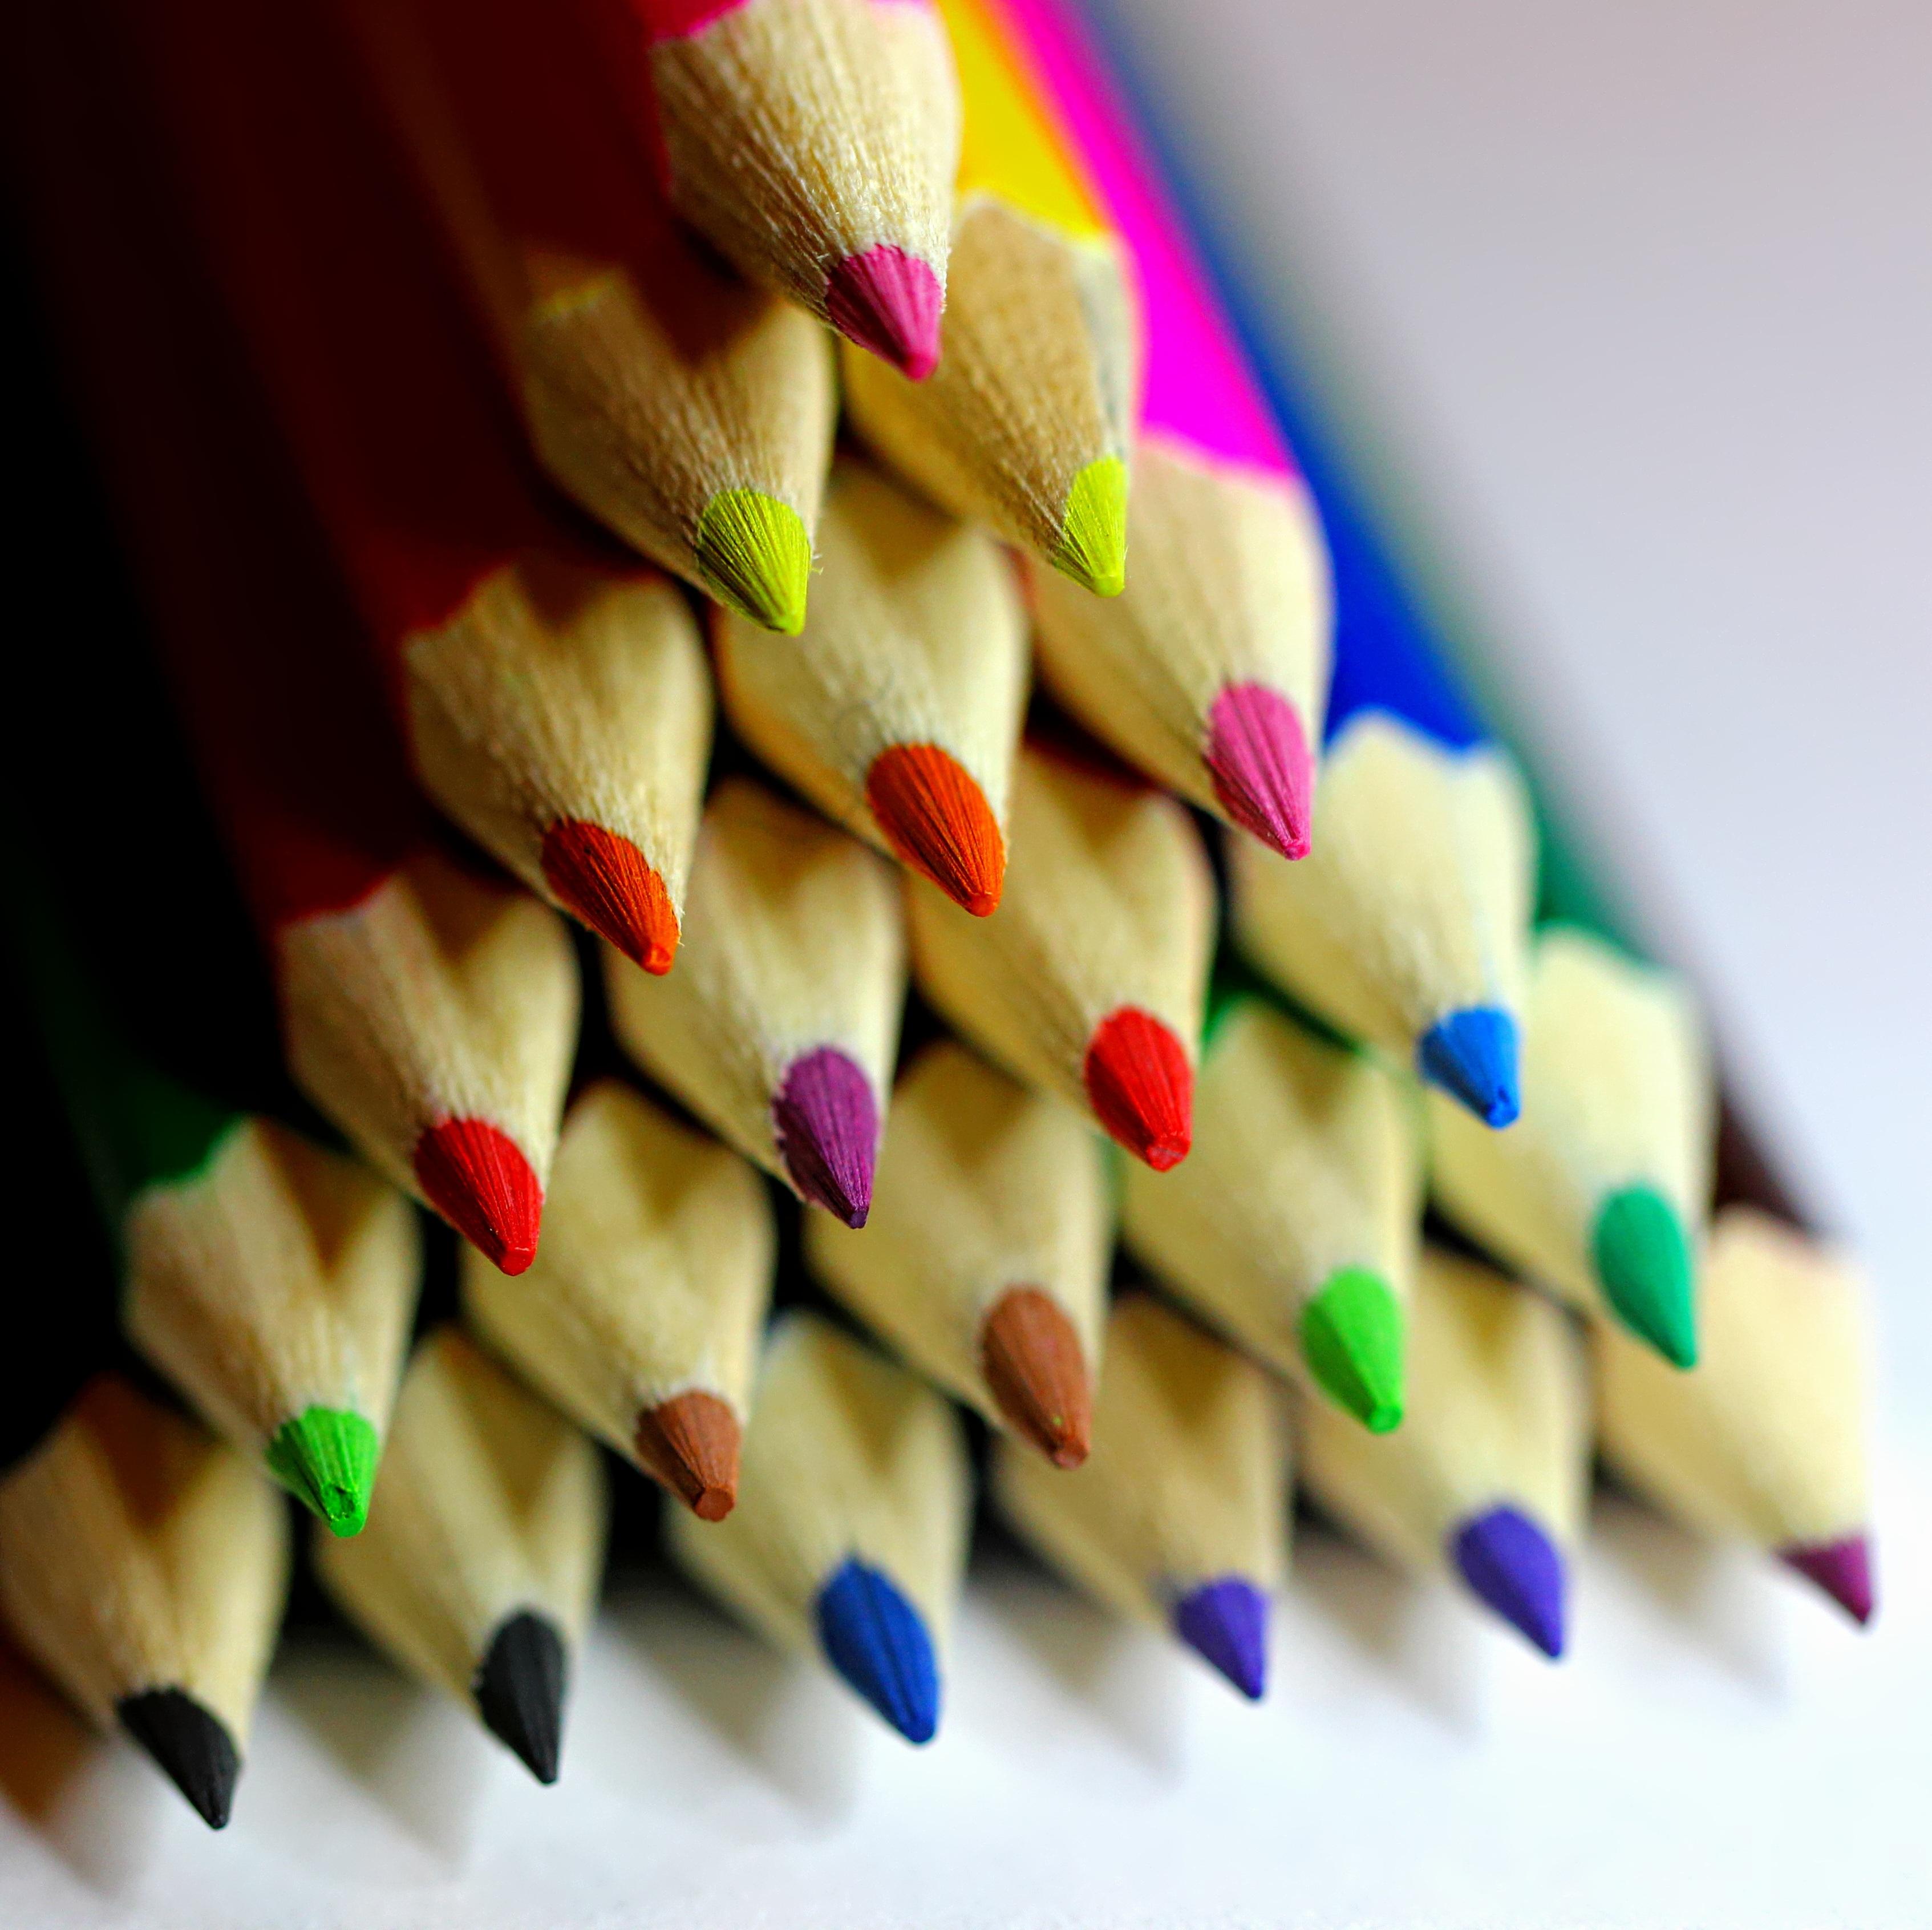 Fotos gratis : pétalo, rojo, azul, negro, rosado, infancia, pintura ...